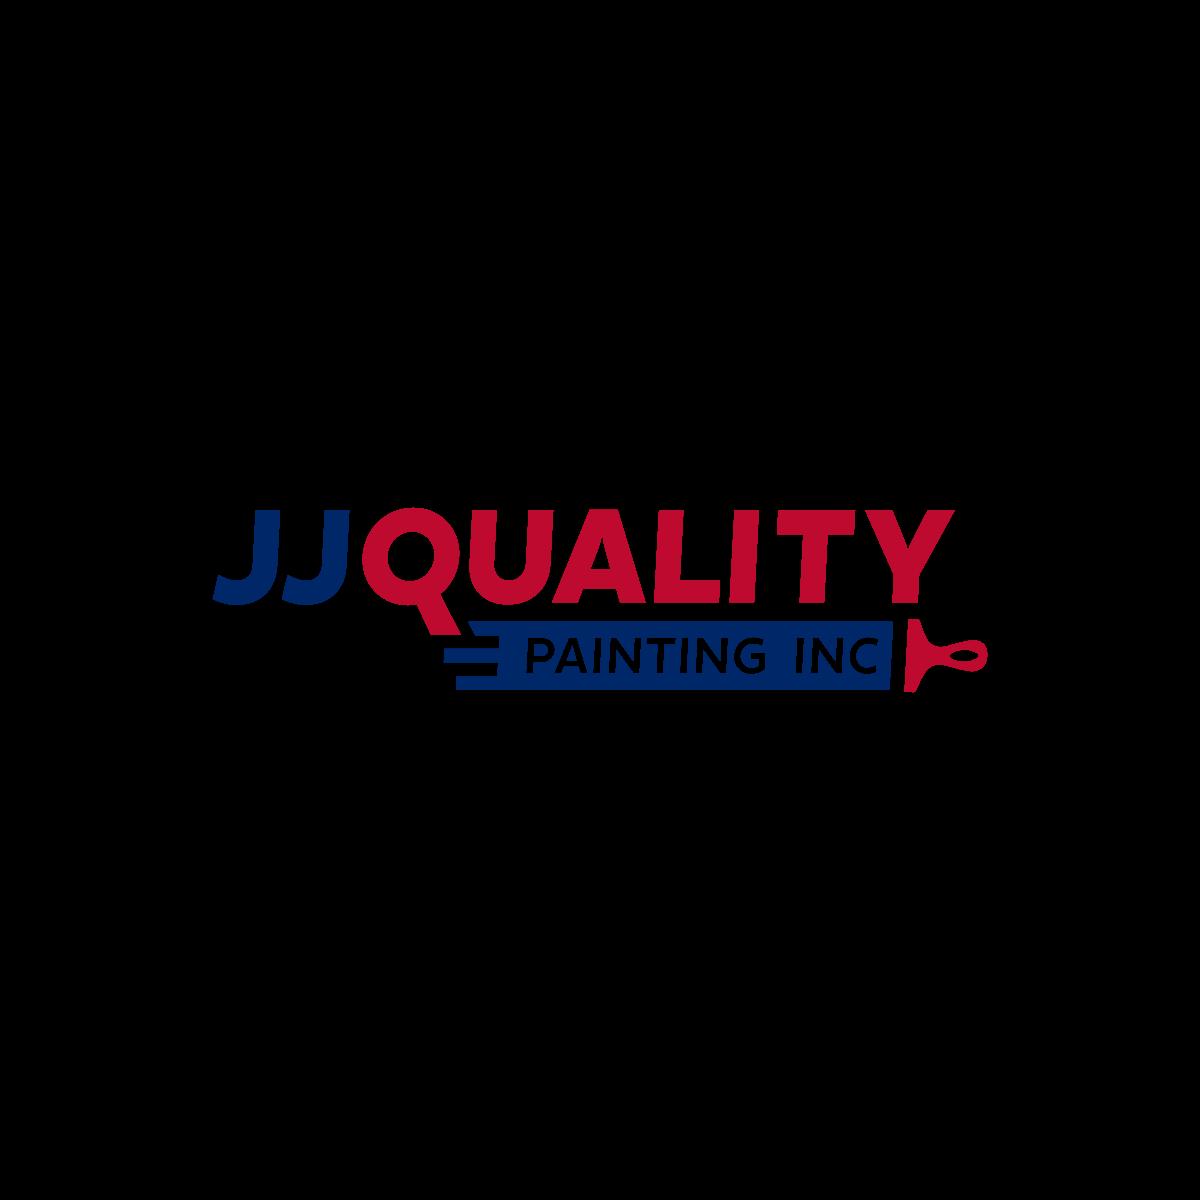 JJ Quality Painting Logo